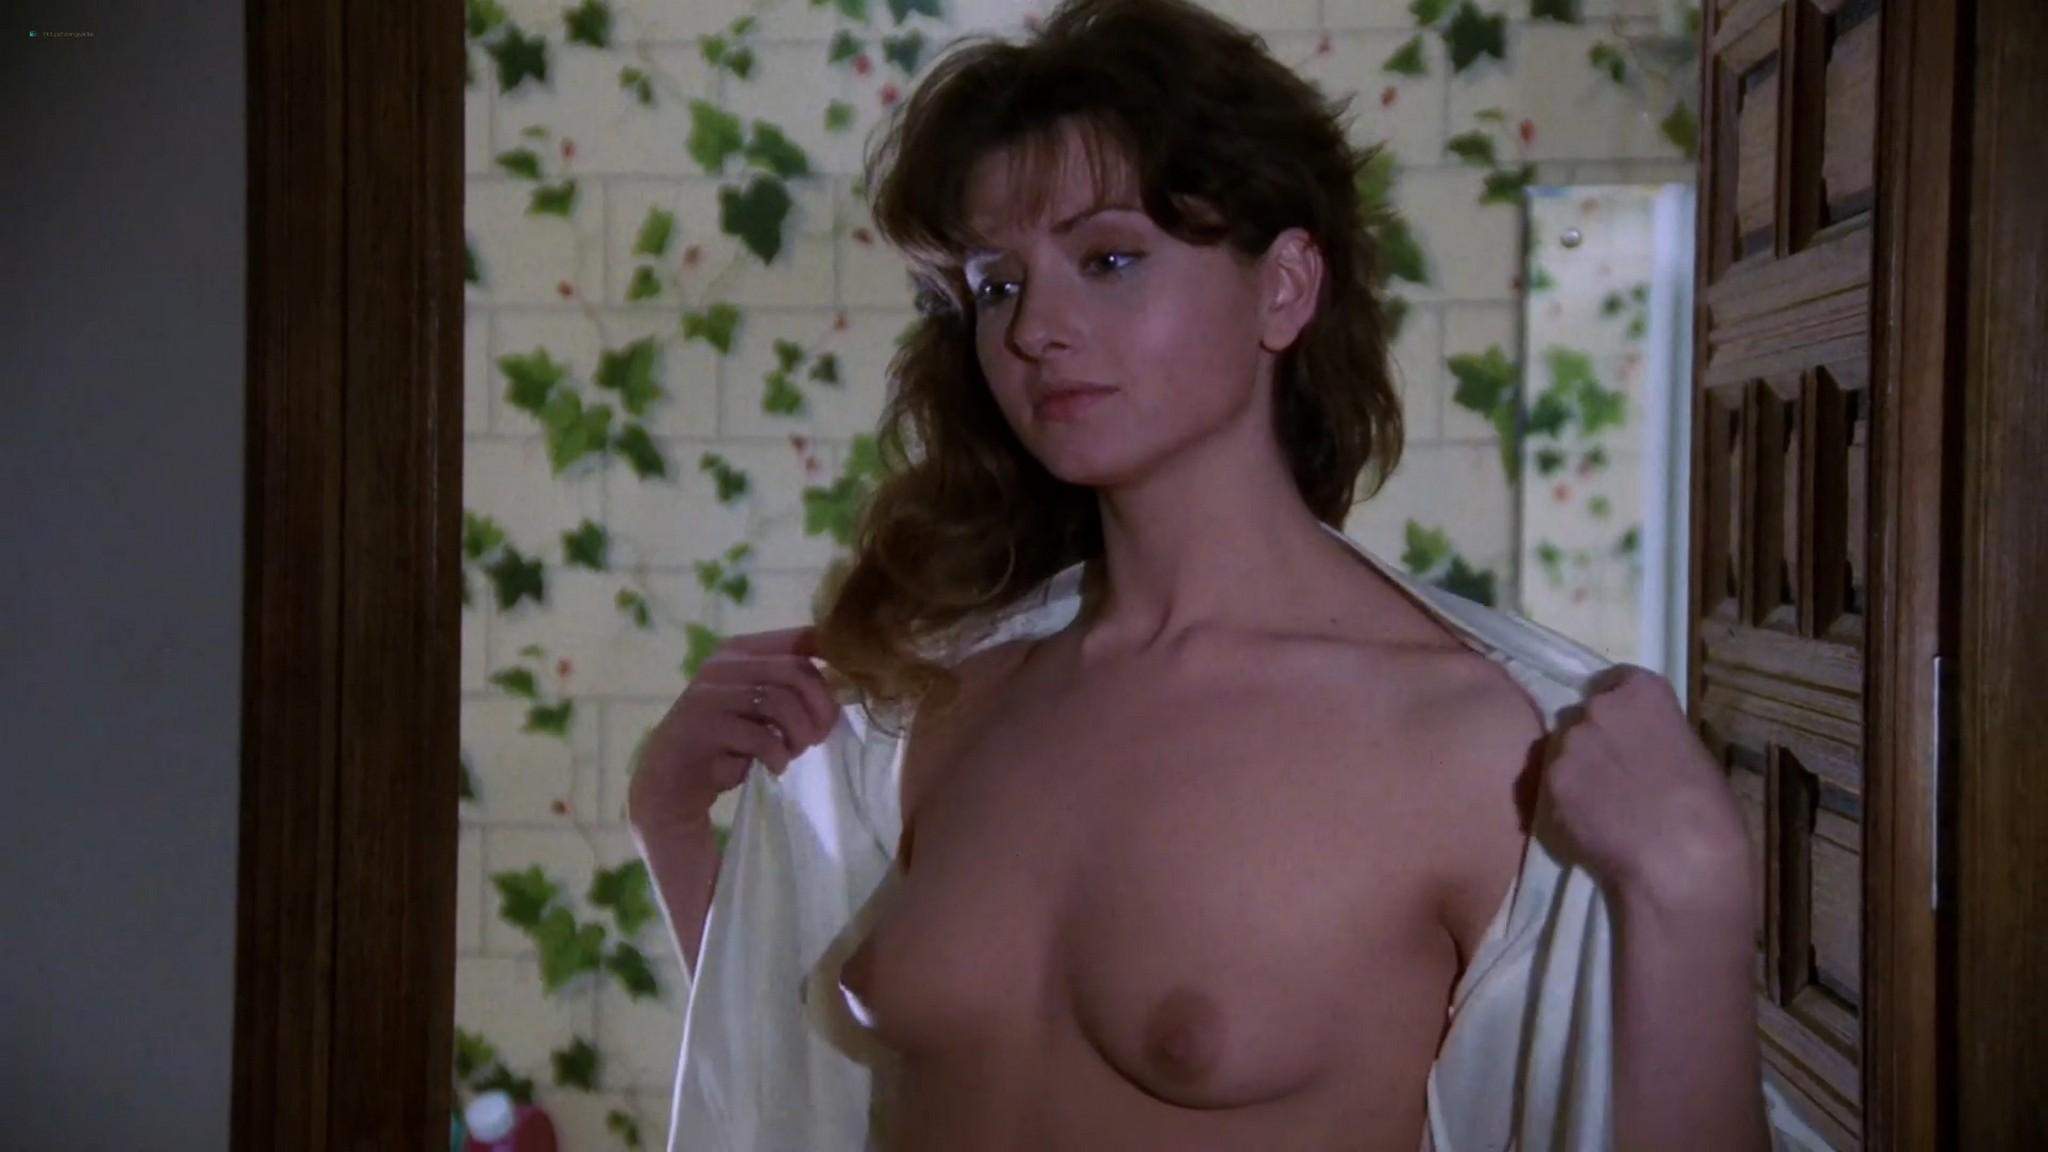 Carole Kirkham nude full frontal Silvia Miro Paquita Ondiviela all nude bush Panic Beats ES 1983 1080p BluRay 9